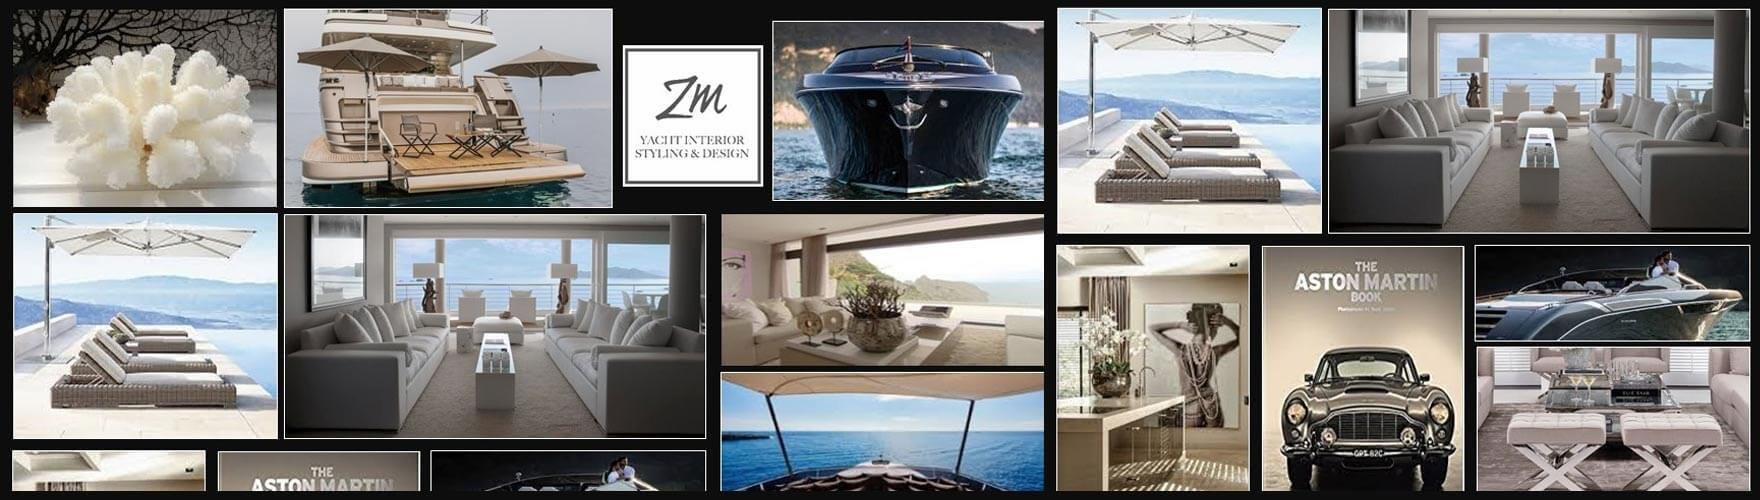 ZM Yacht Design